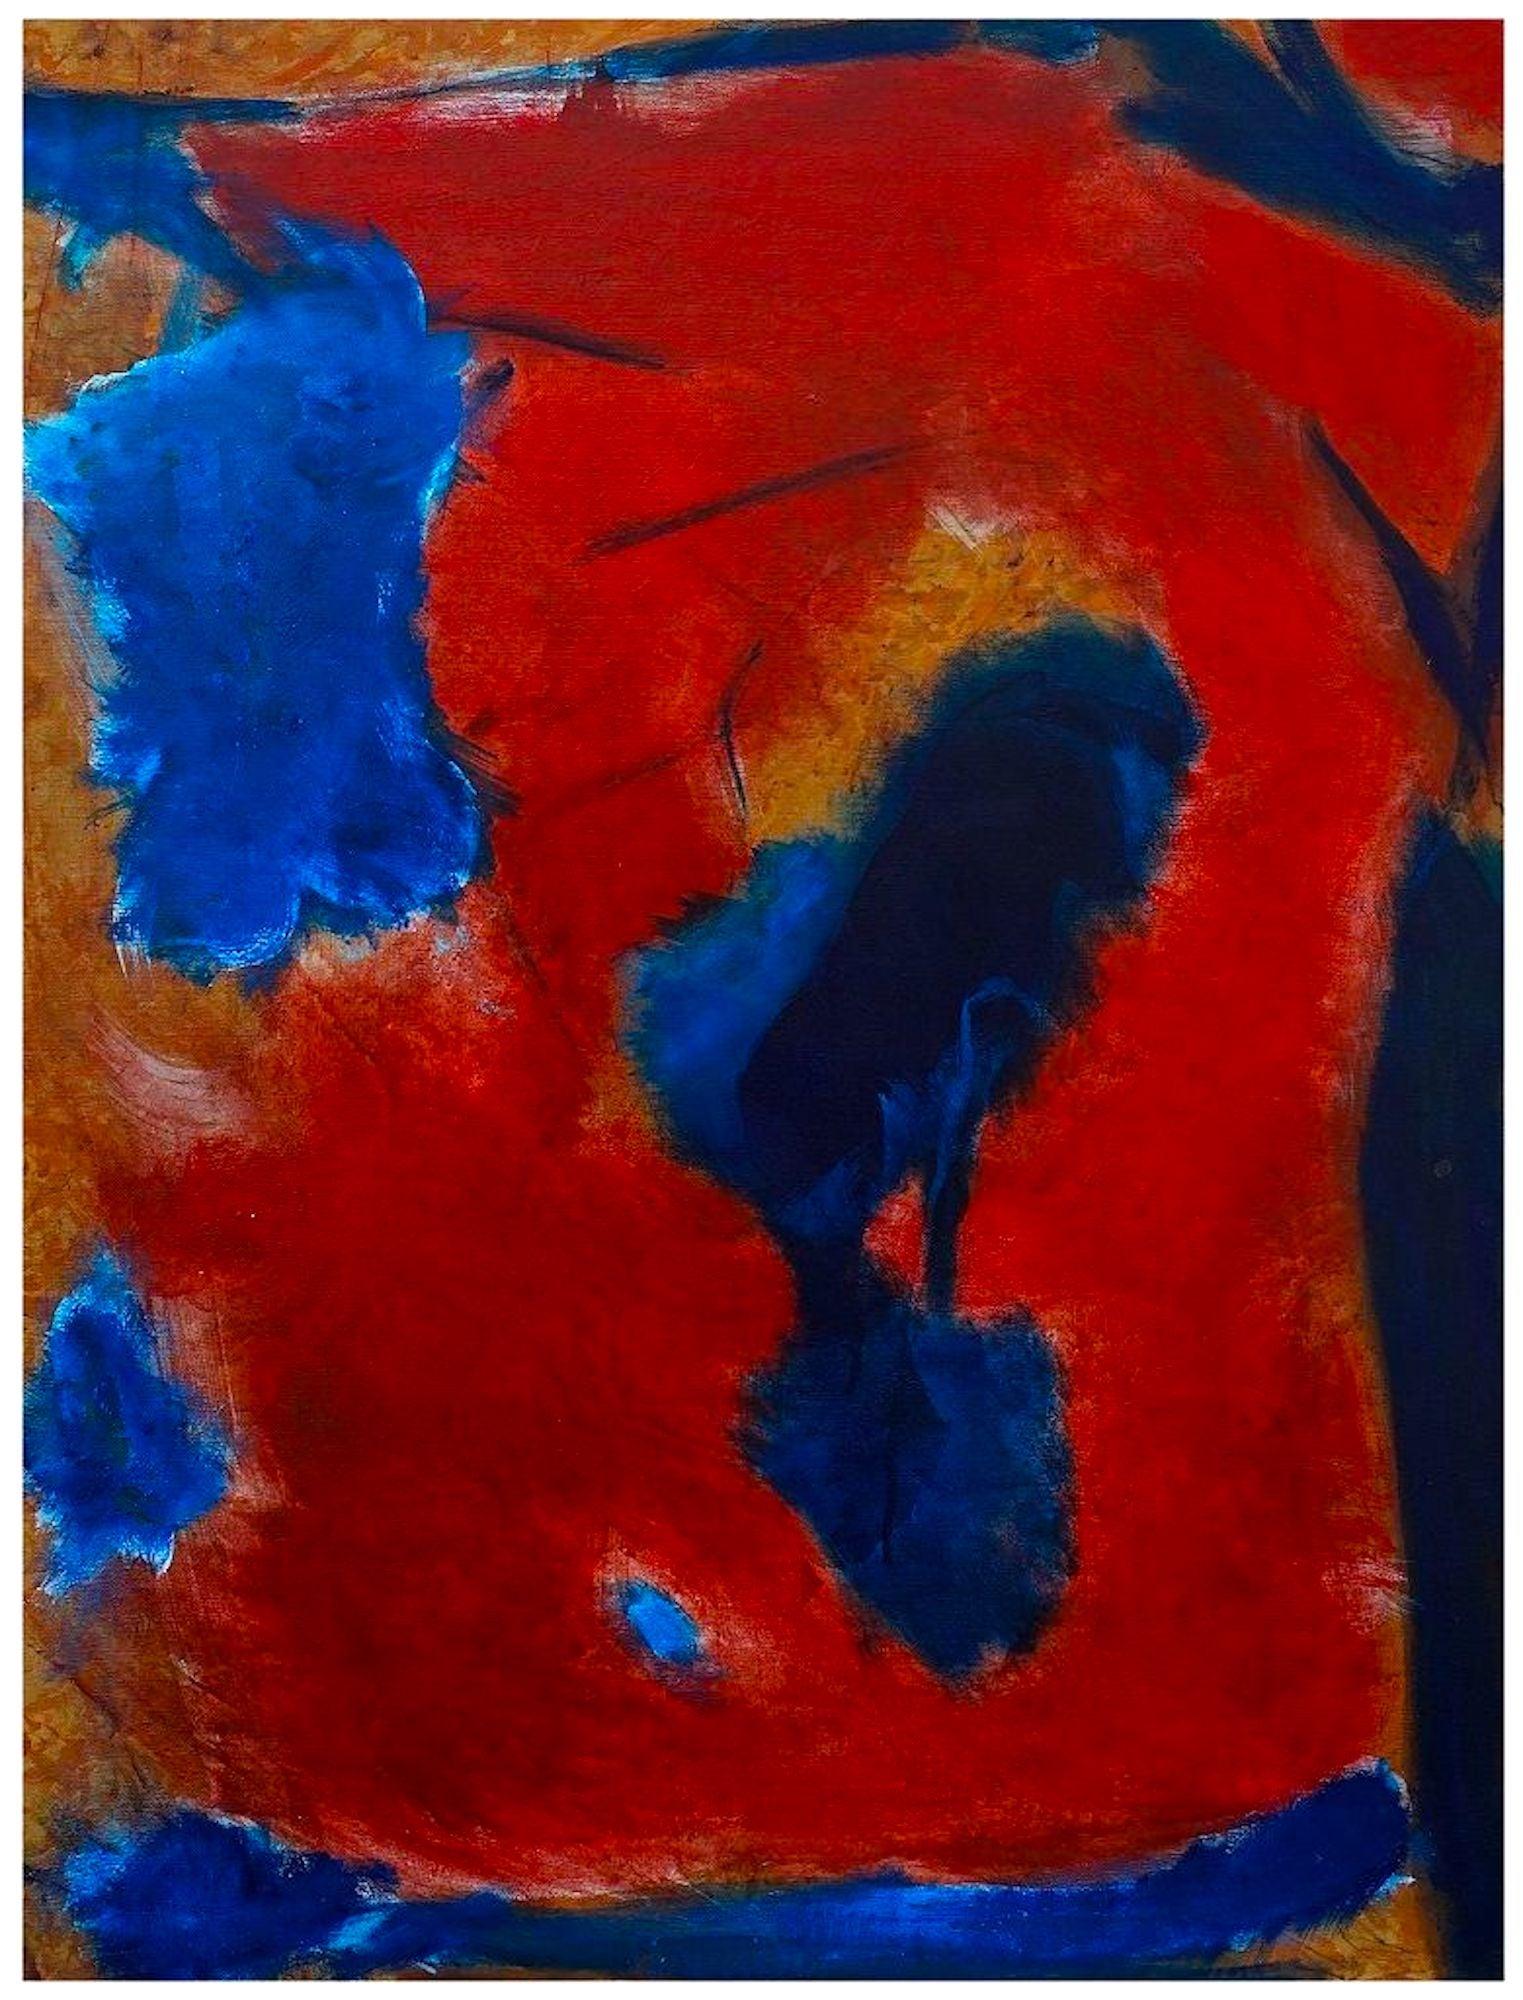 Informal Painting - Oil Painting 2018